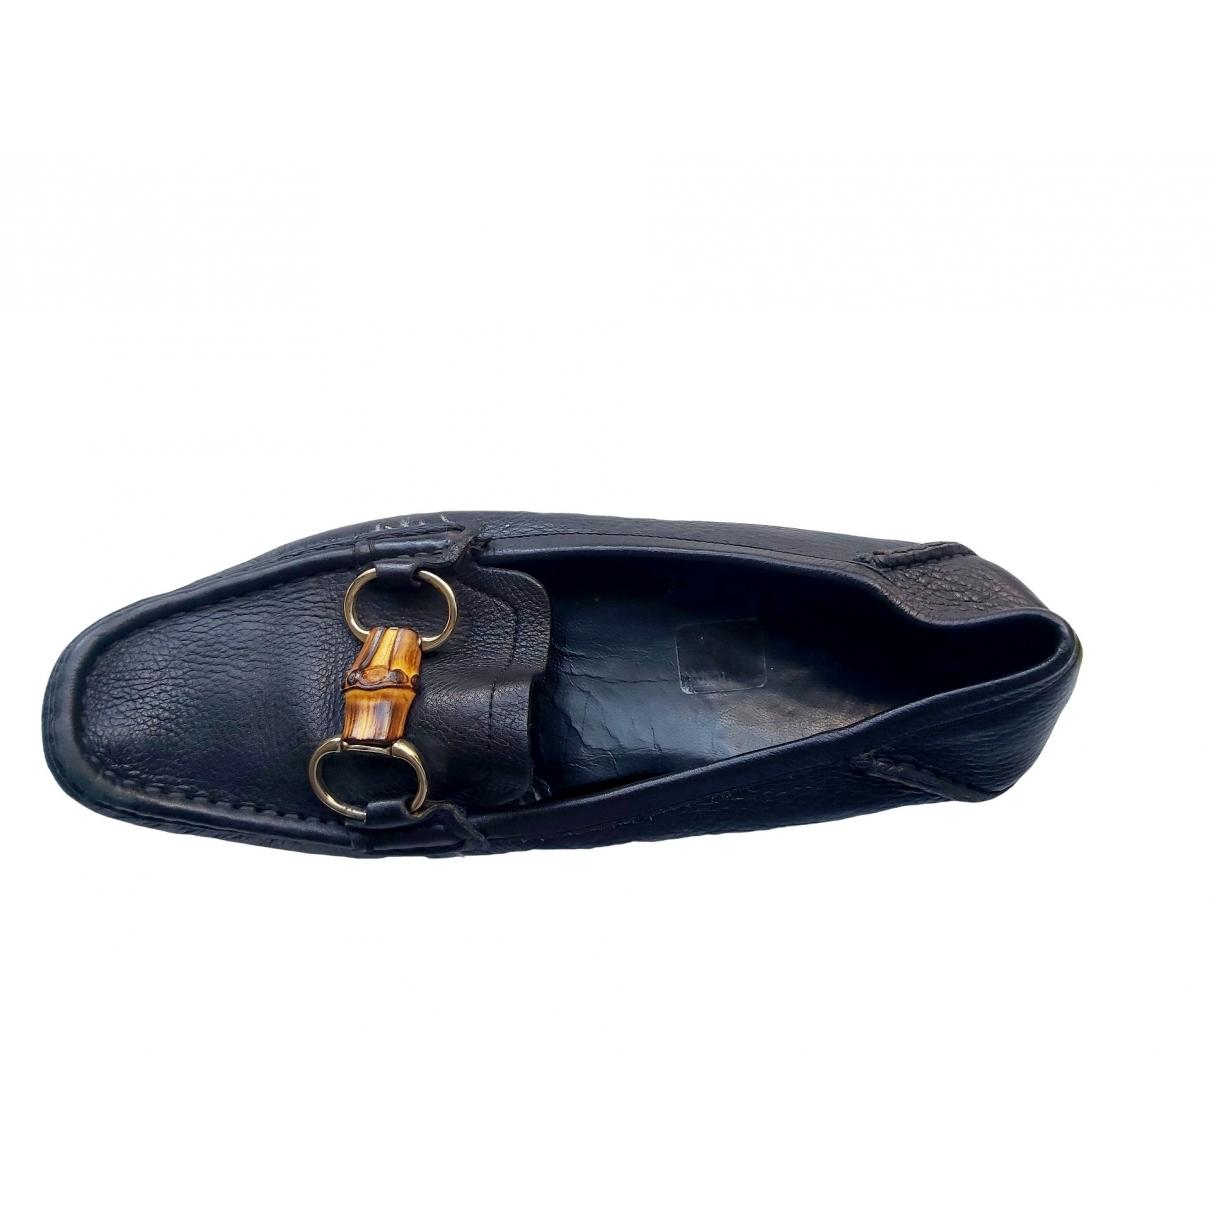 Gucci \N Black Leather Flats for Women 39.5 EU